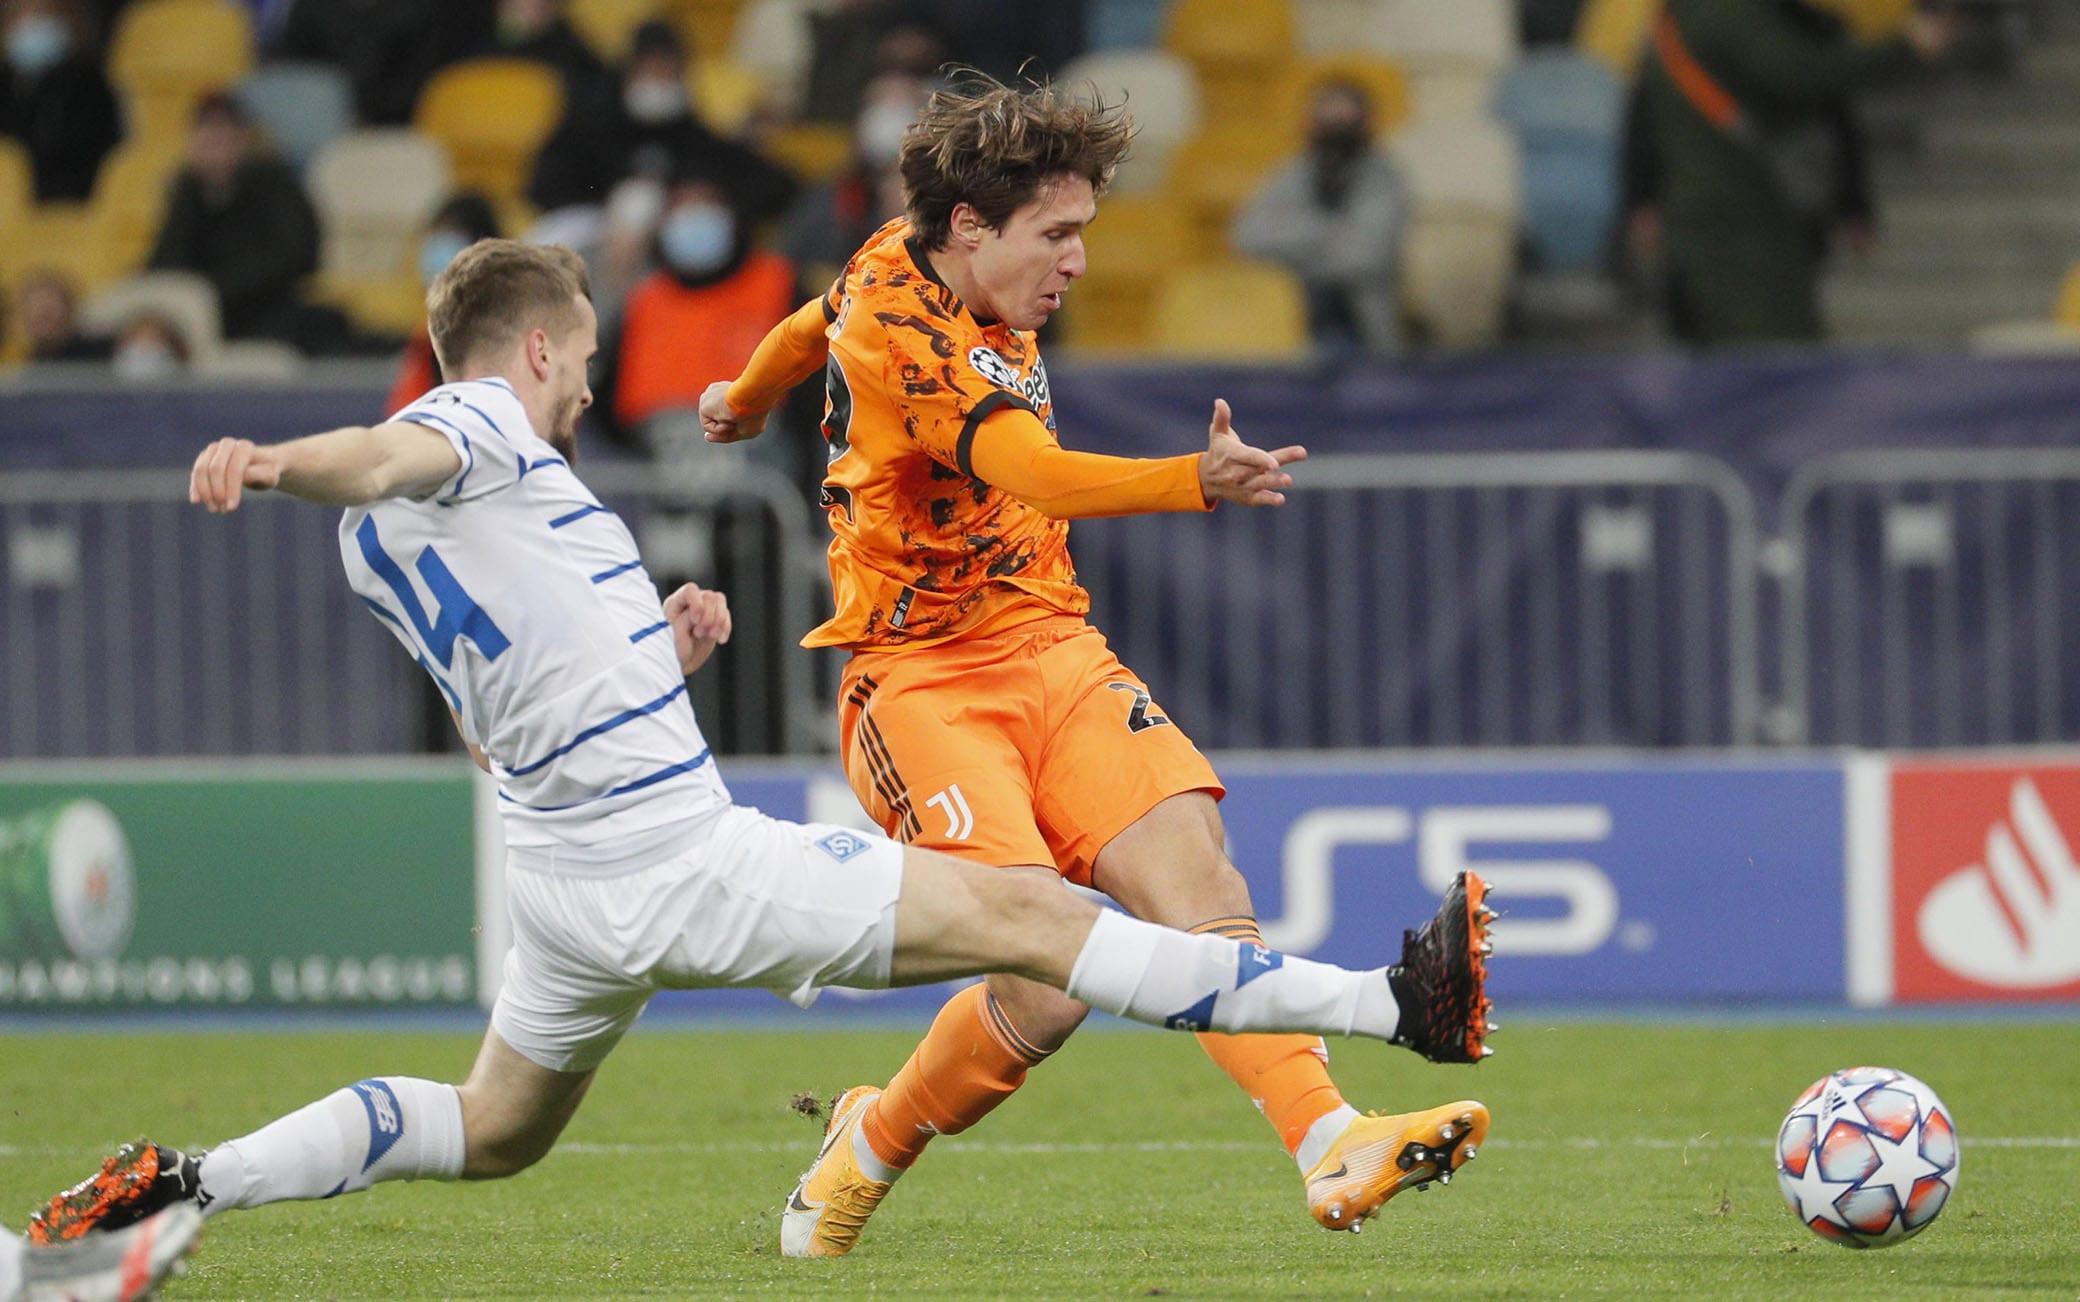 Dinamo Kiev - Juventus: cronaca diretta live, risultato in ...  |Dinamo Kiev- Juventus